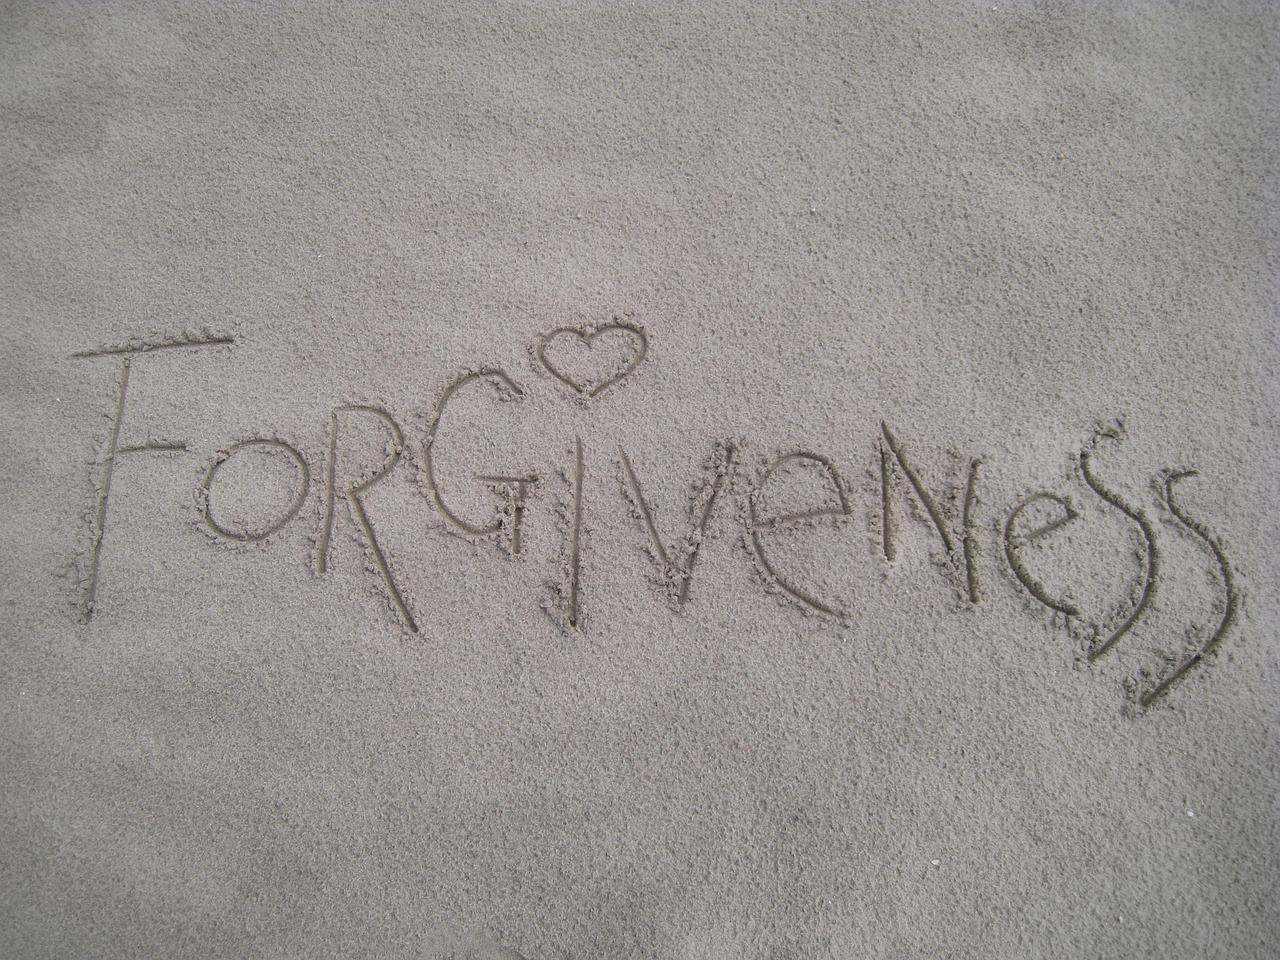 forgiveness-1767432_1280.jpg